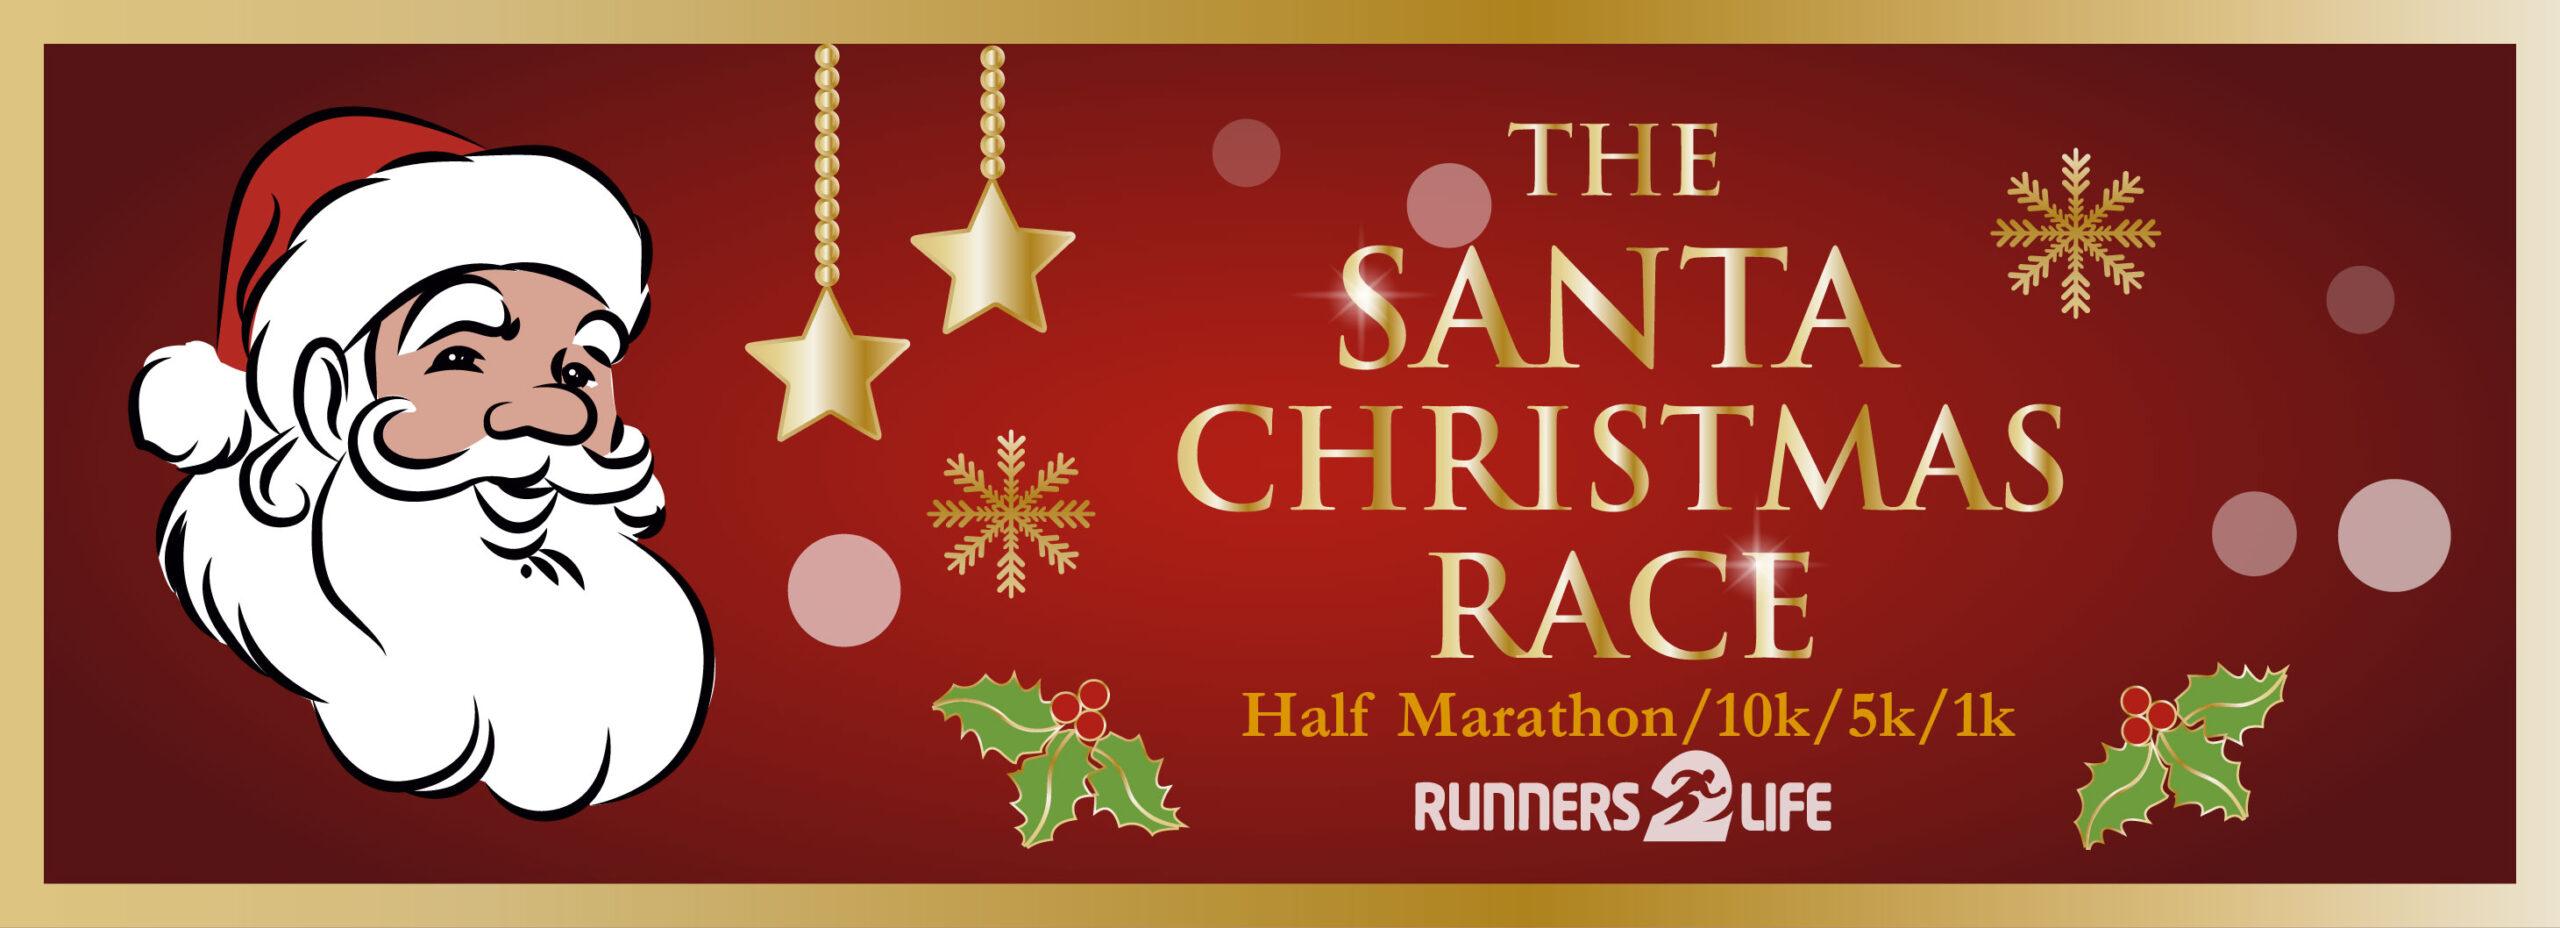 The Santa Christmas Race